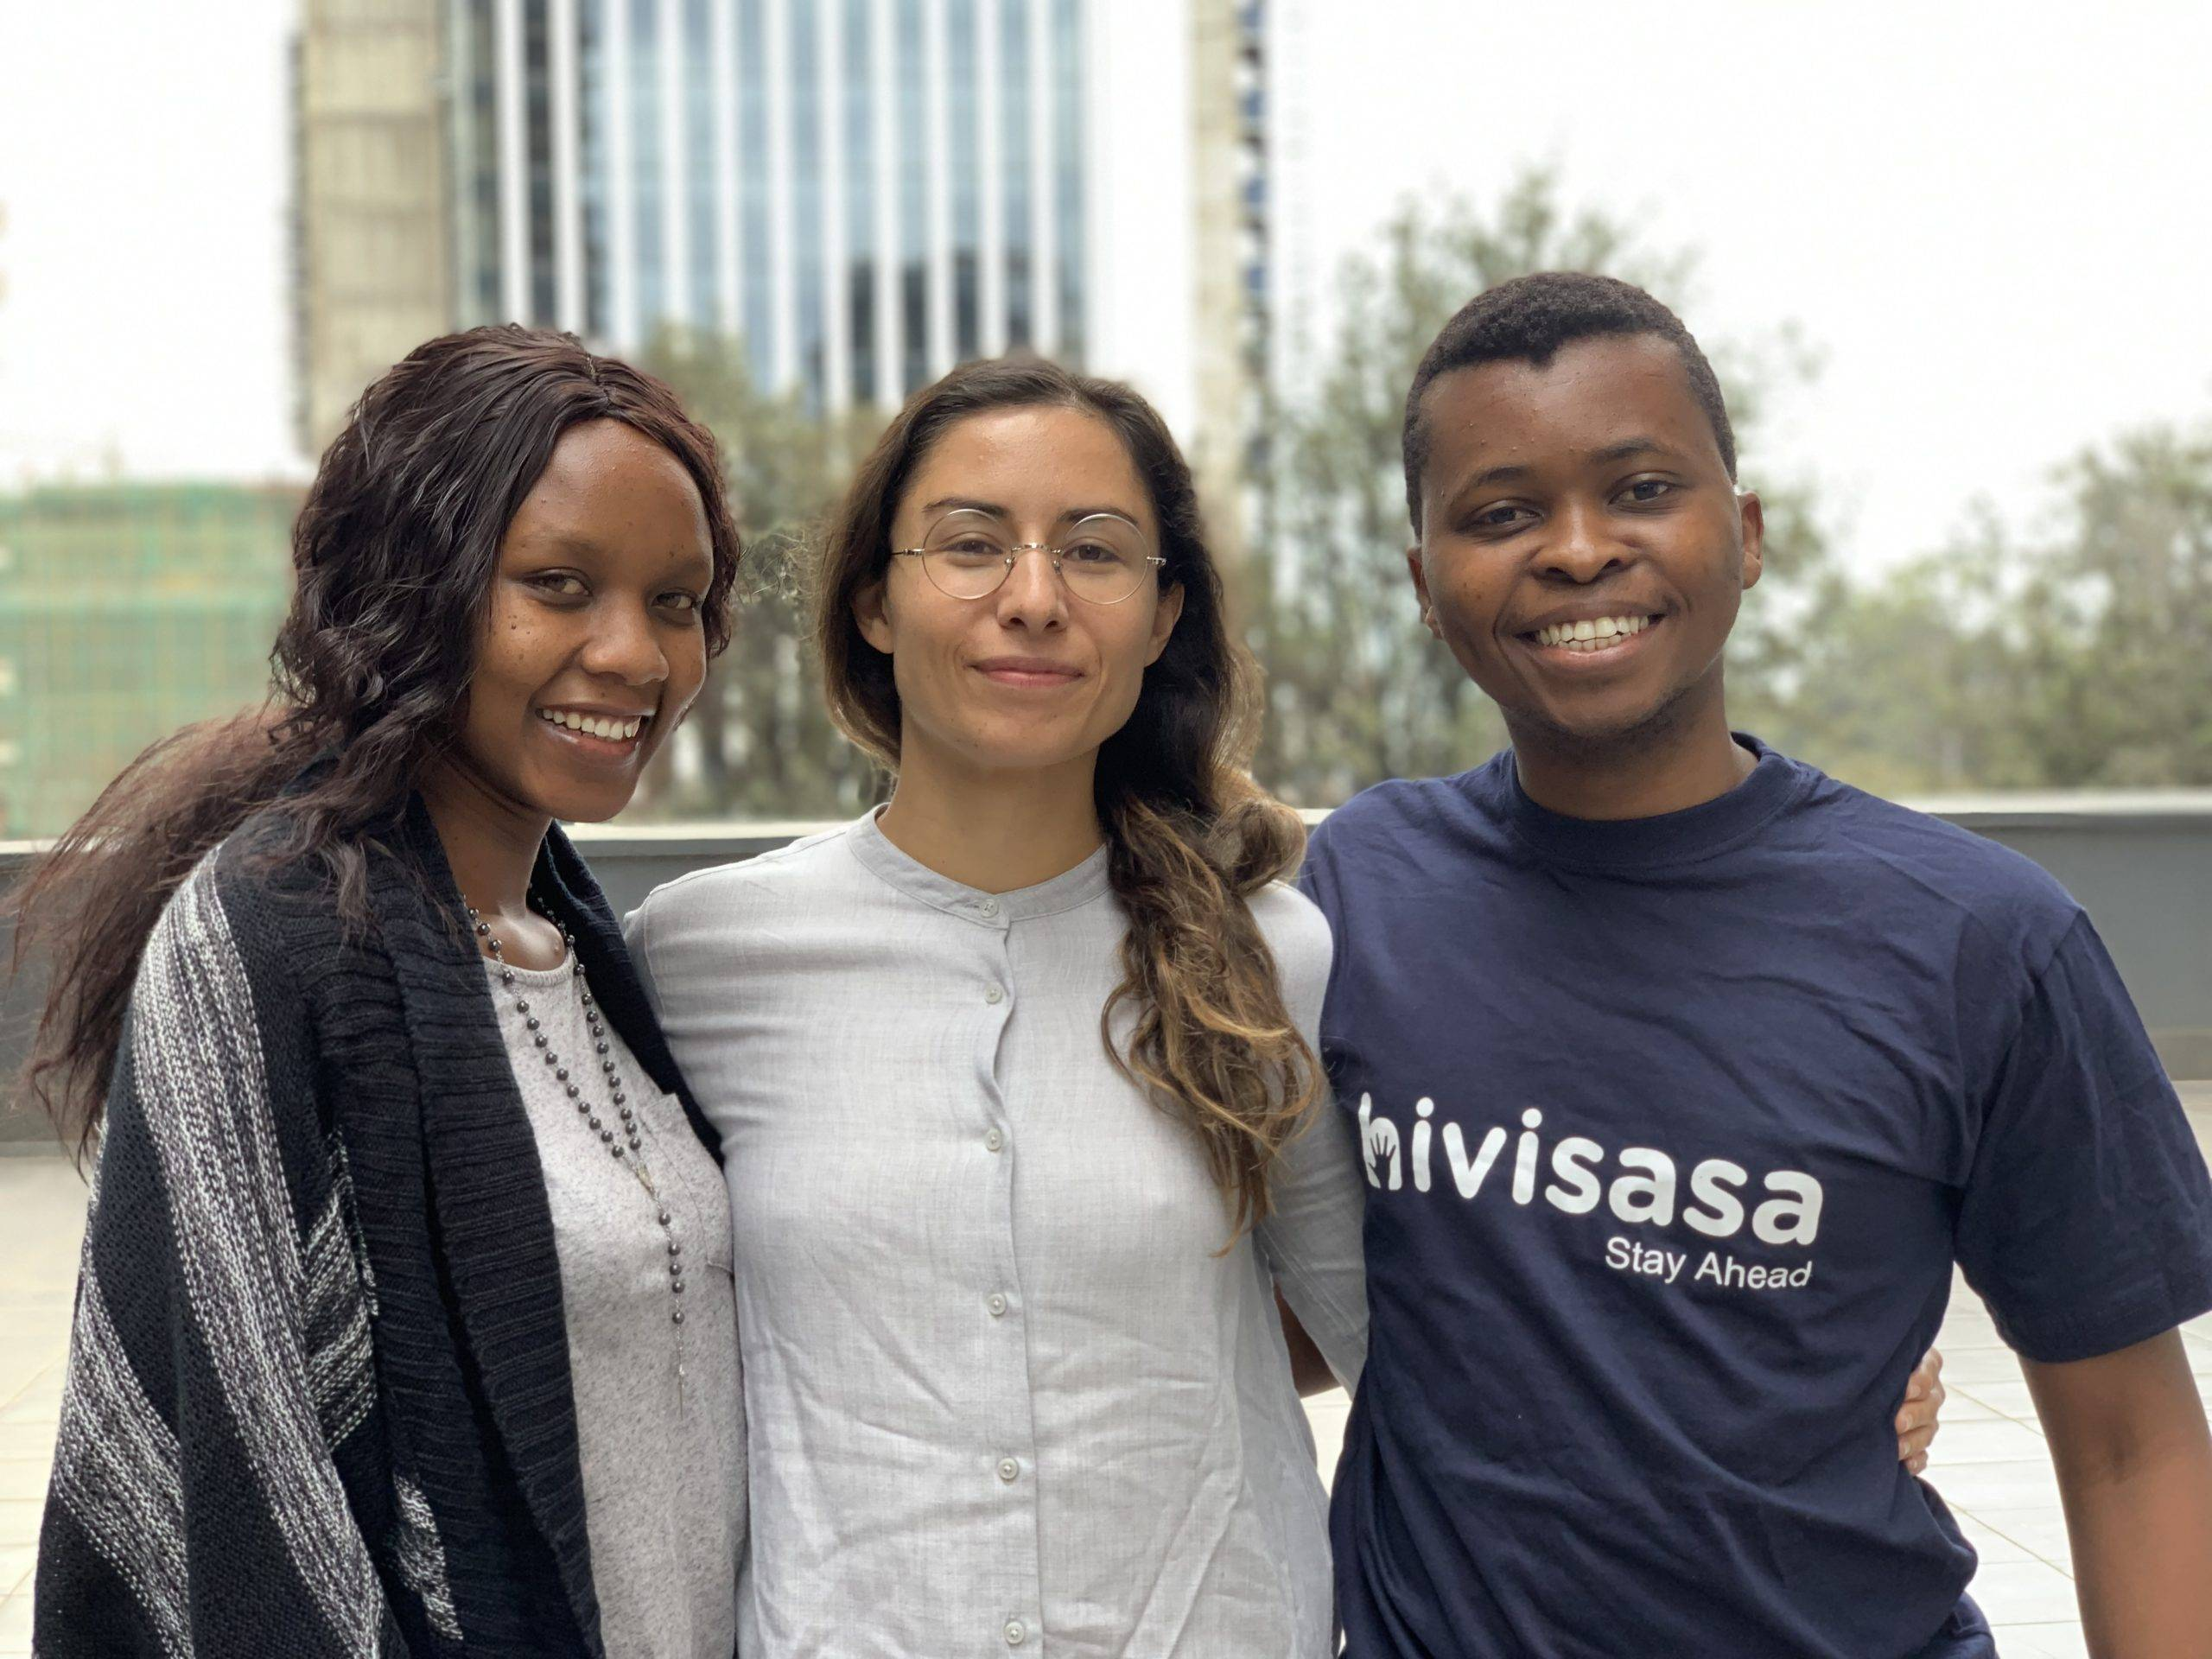 365 Partners With Hivisasa